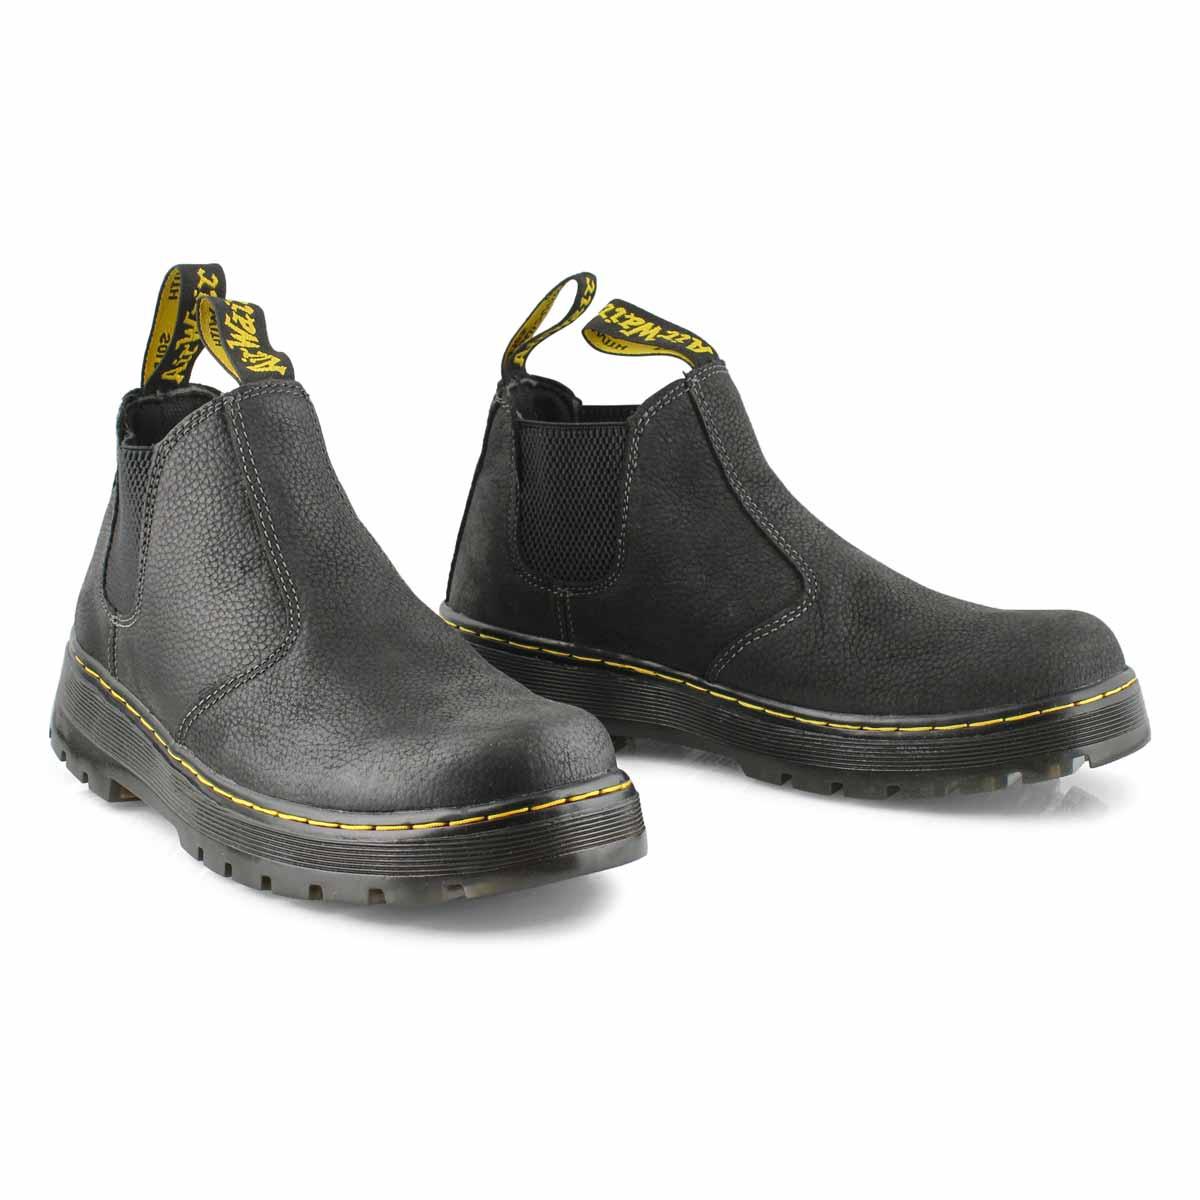 93d0c619139 Men's HARDIE black chelsea boots